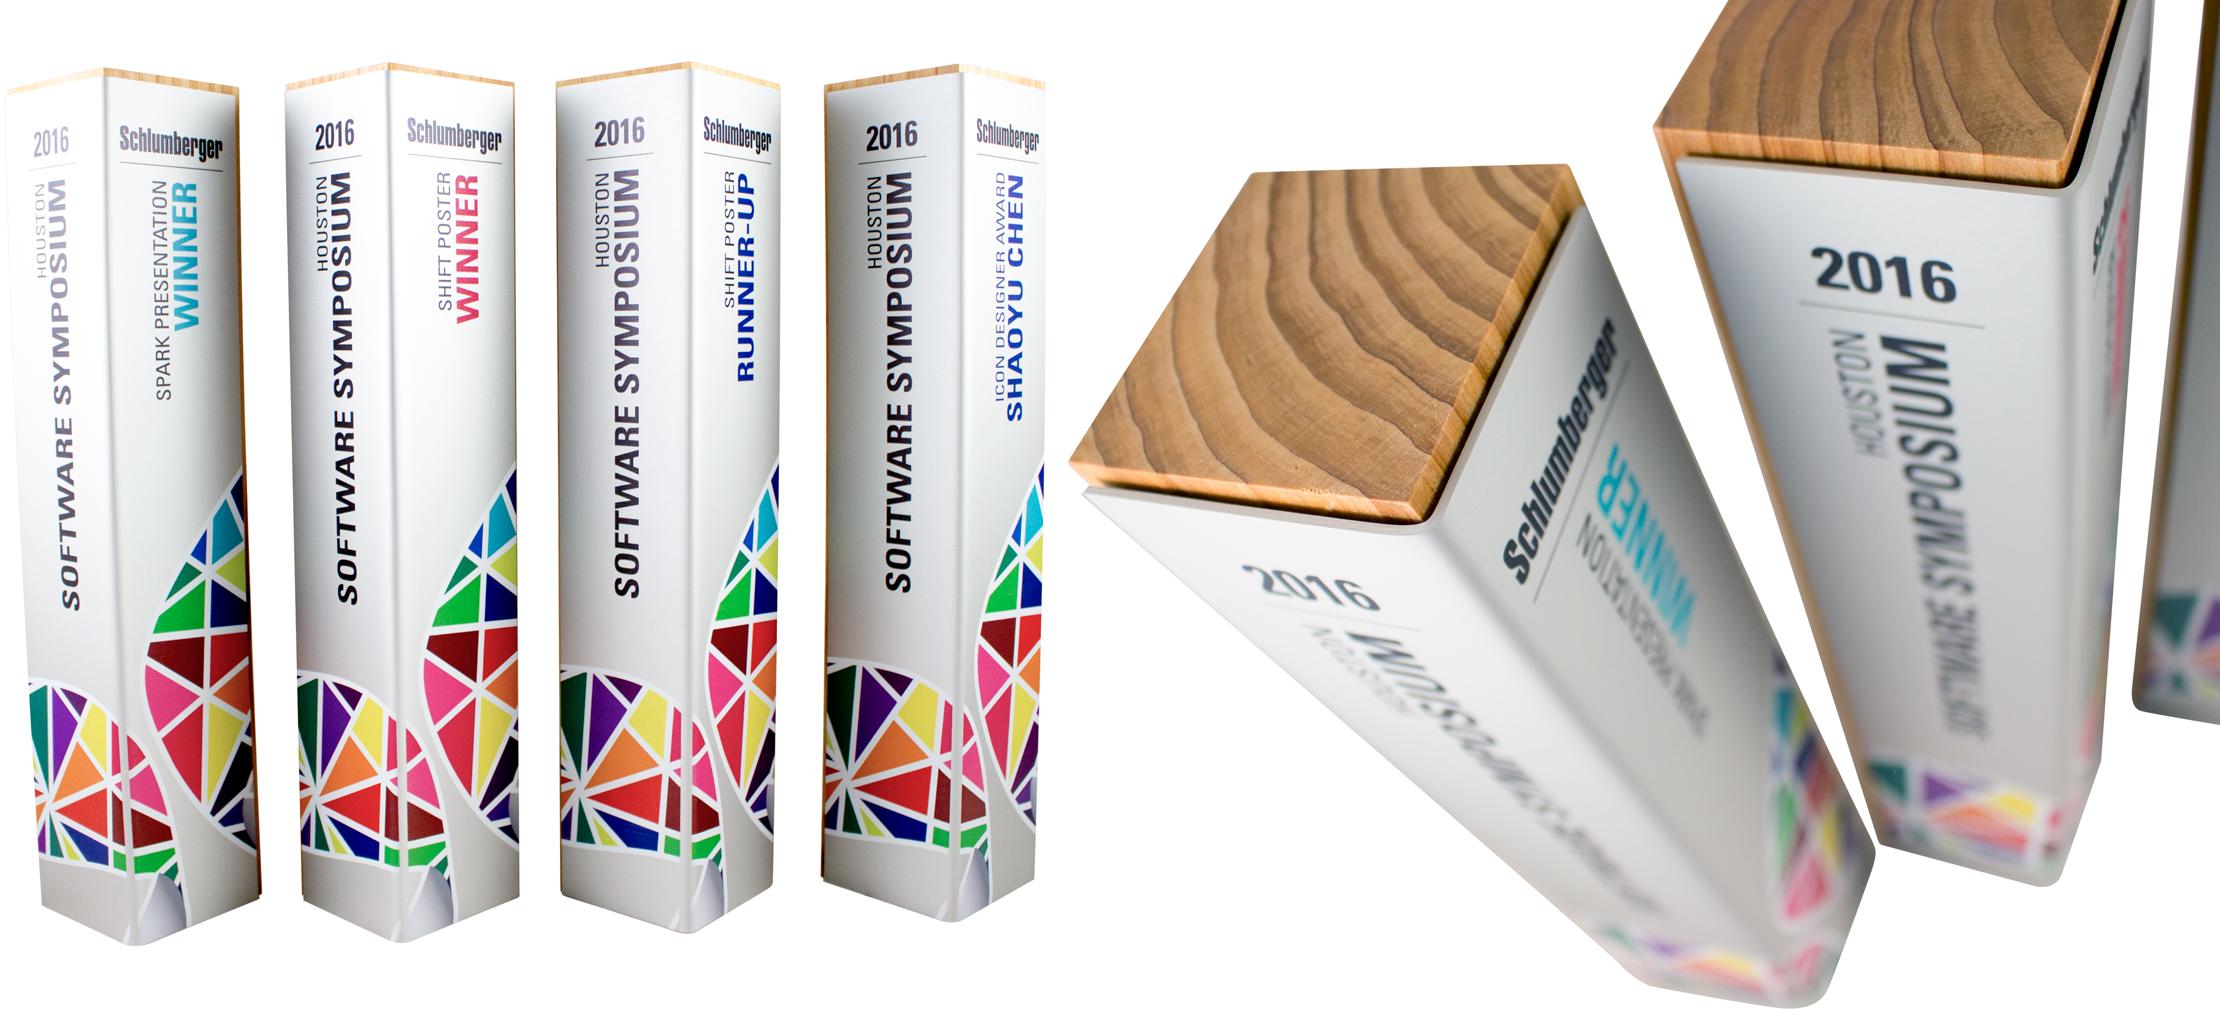 schlumberger - custom eco friendly awards